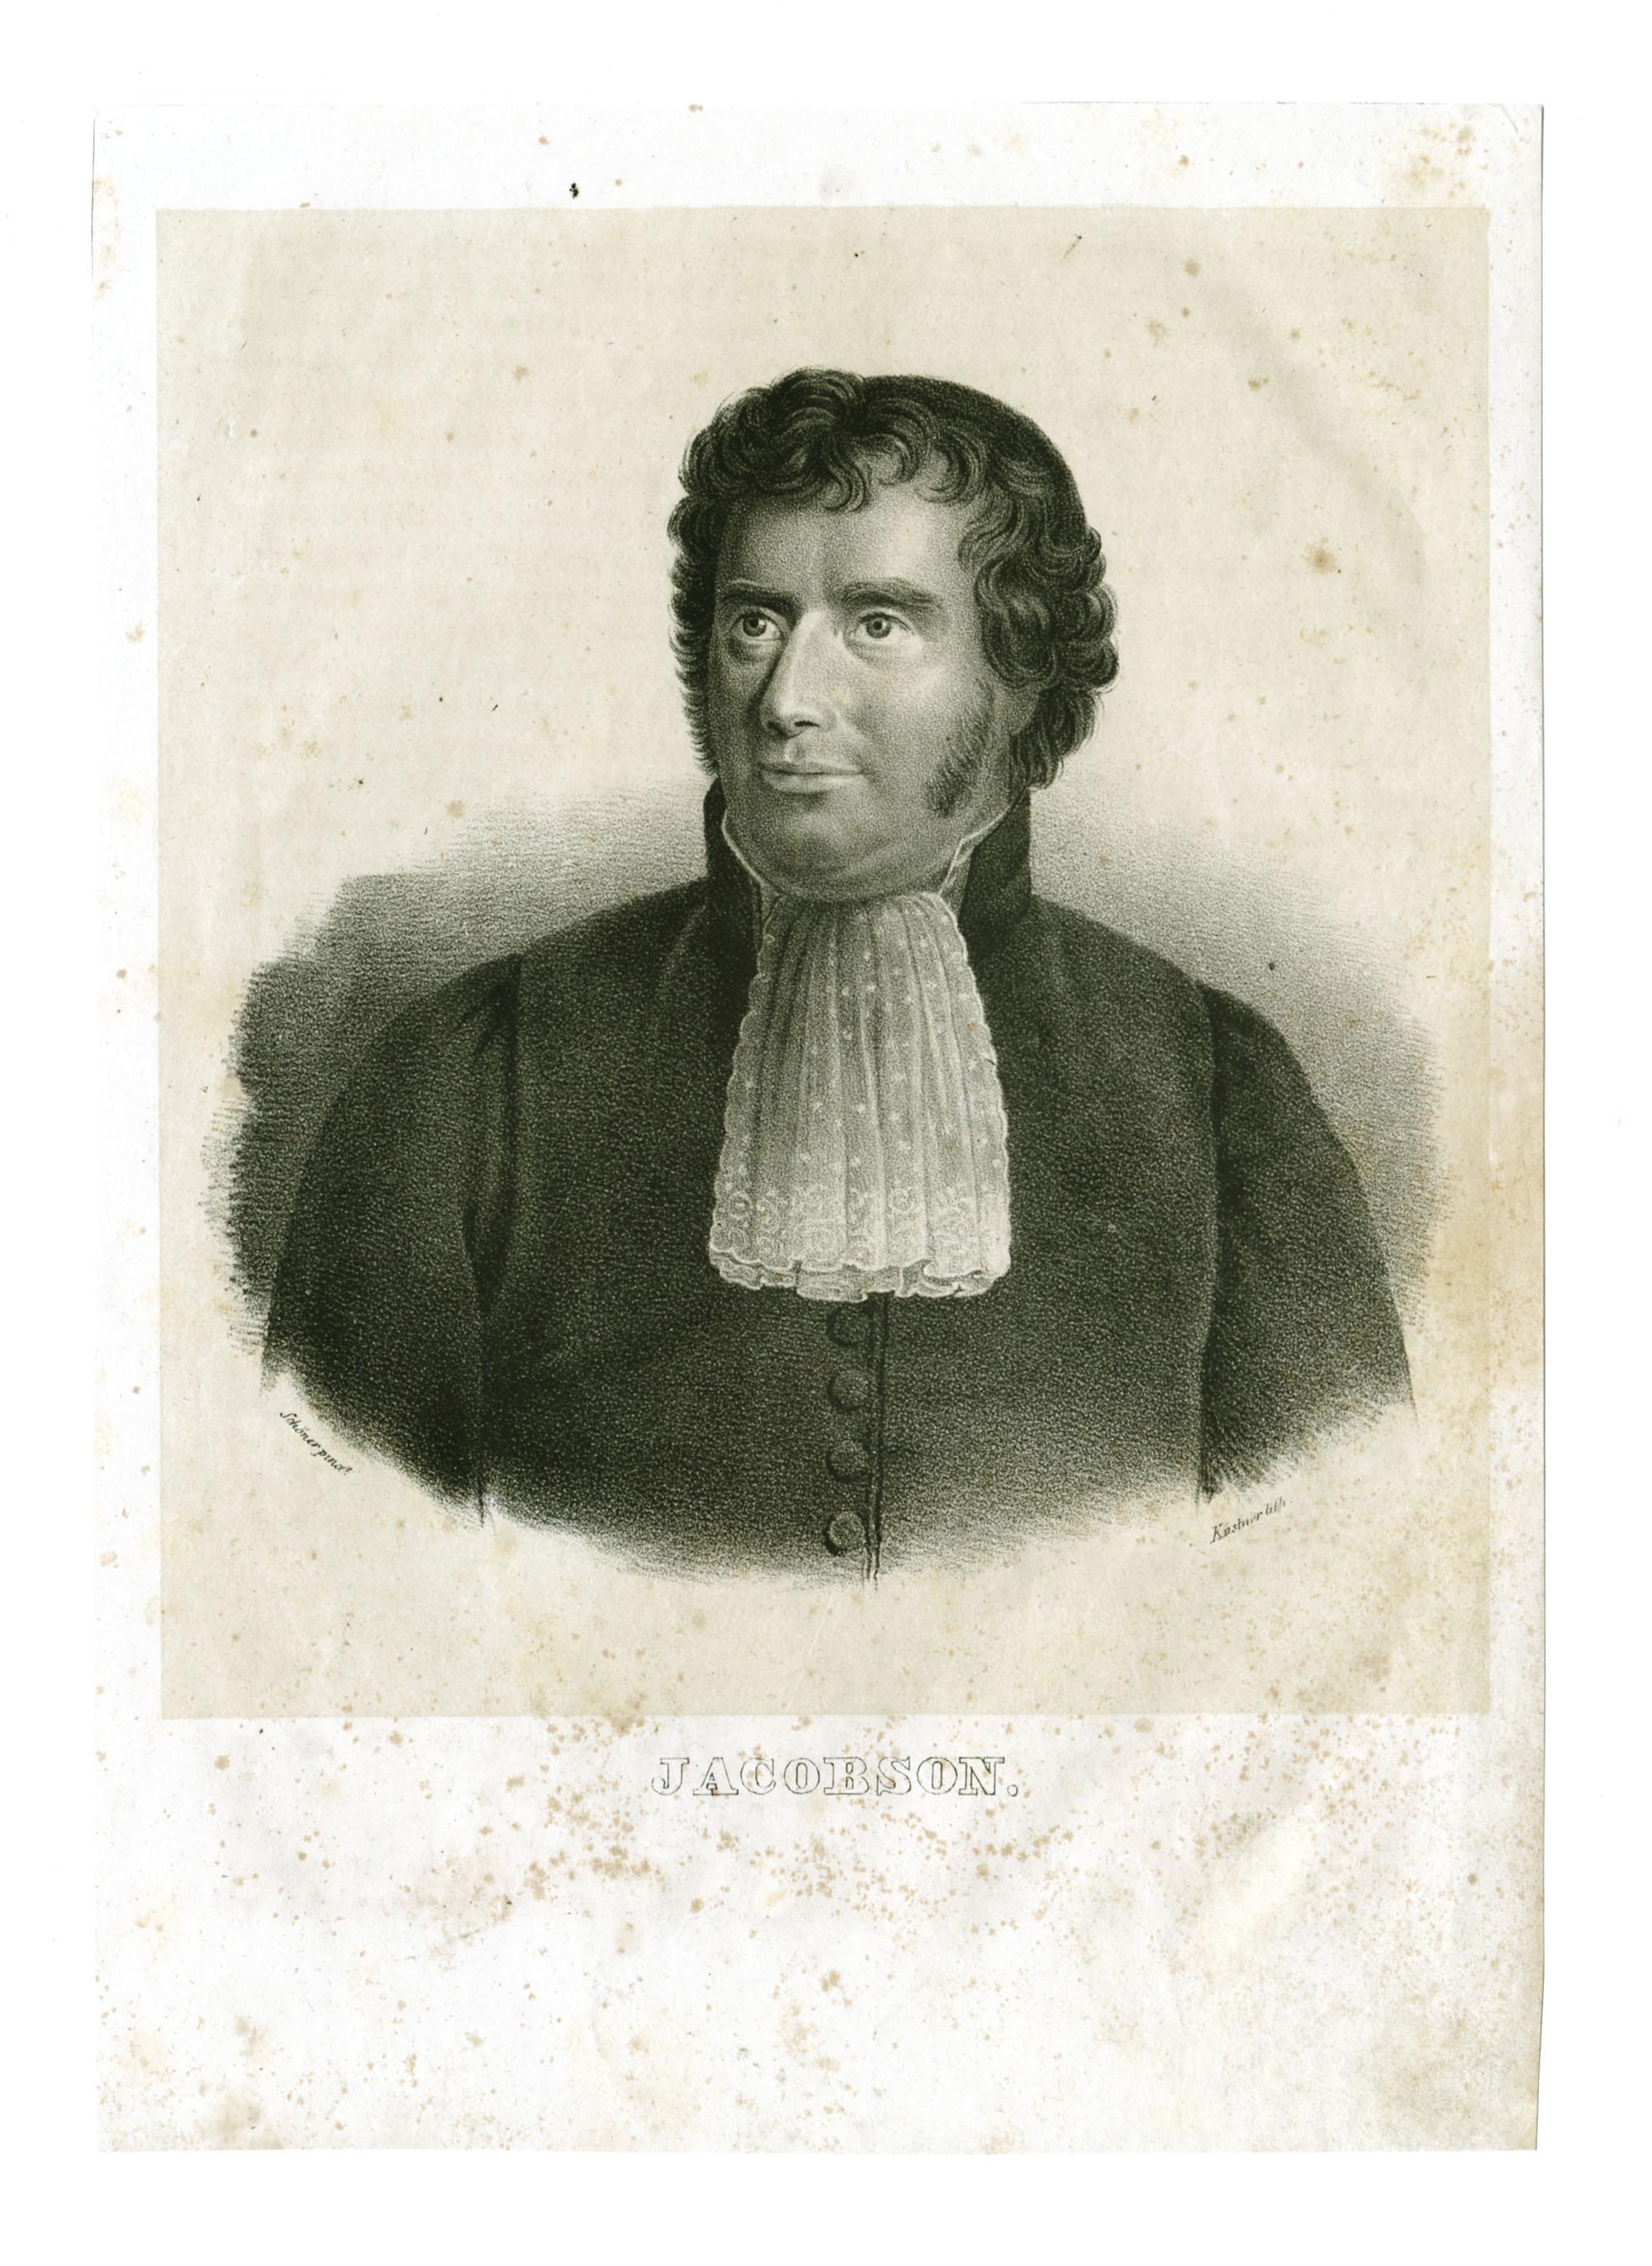 Jacobson